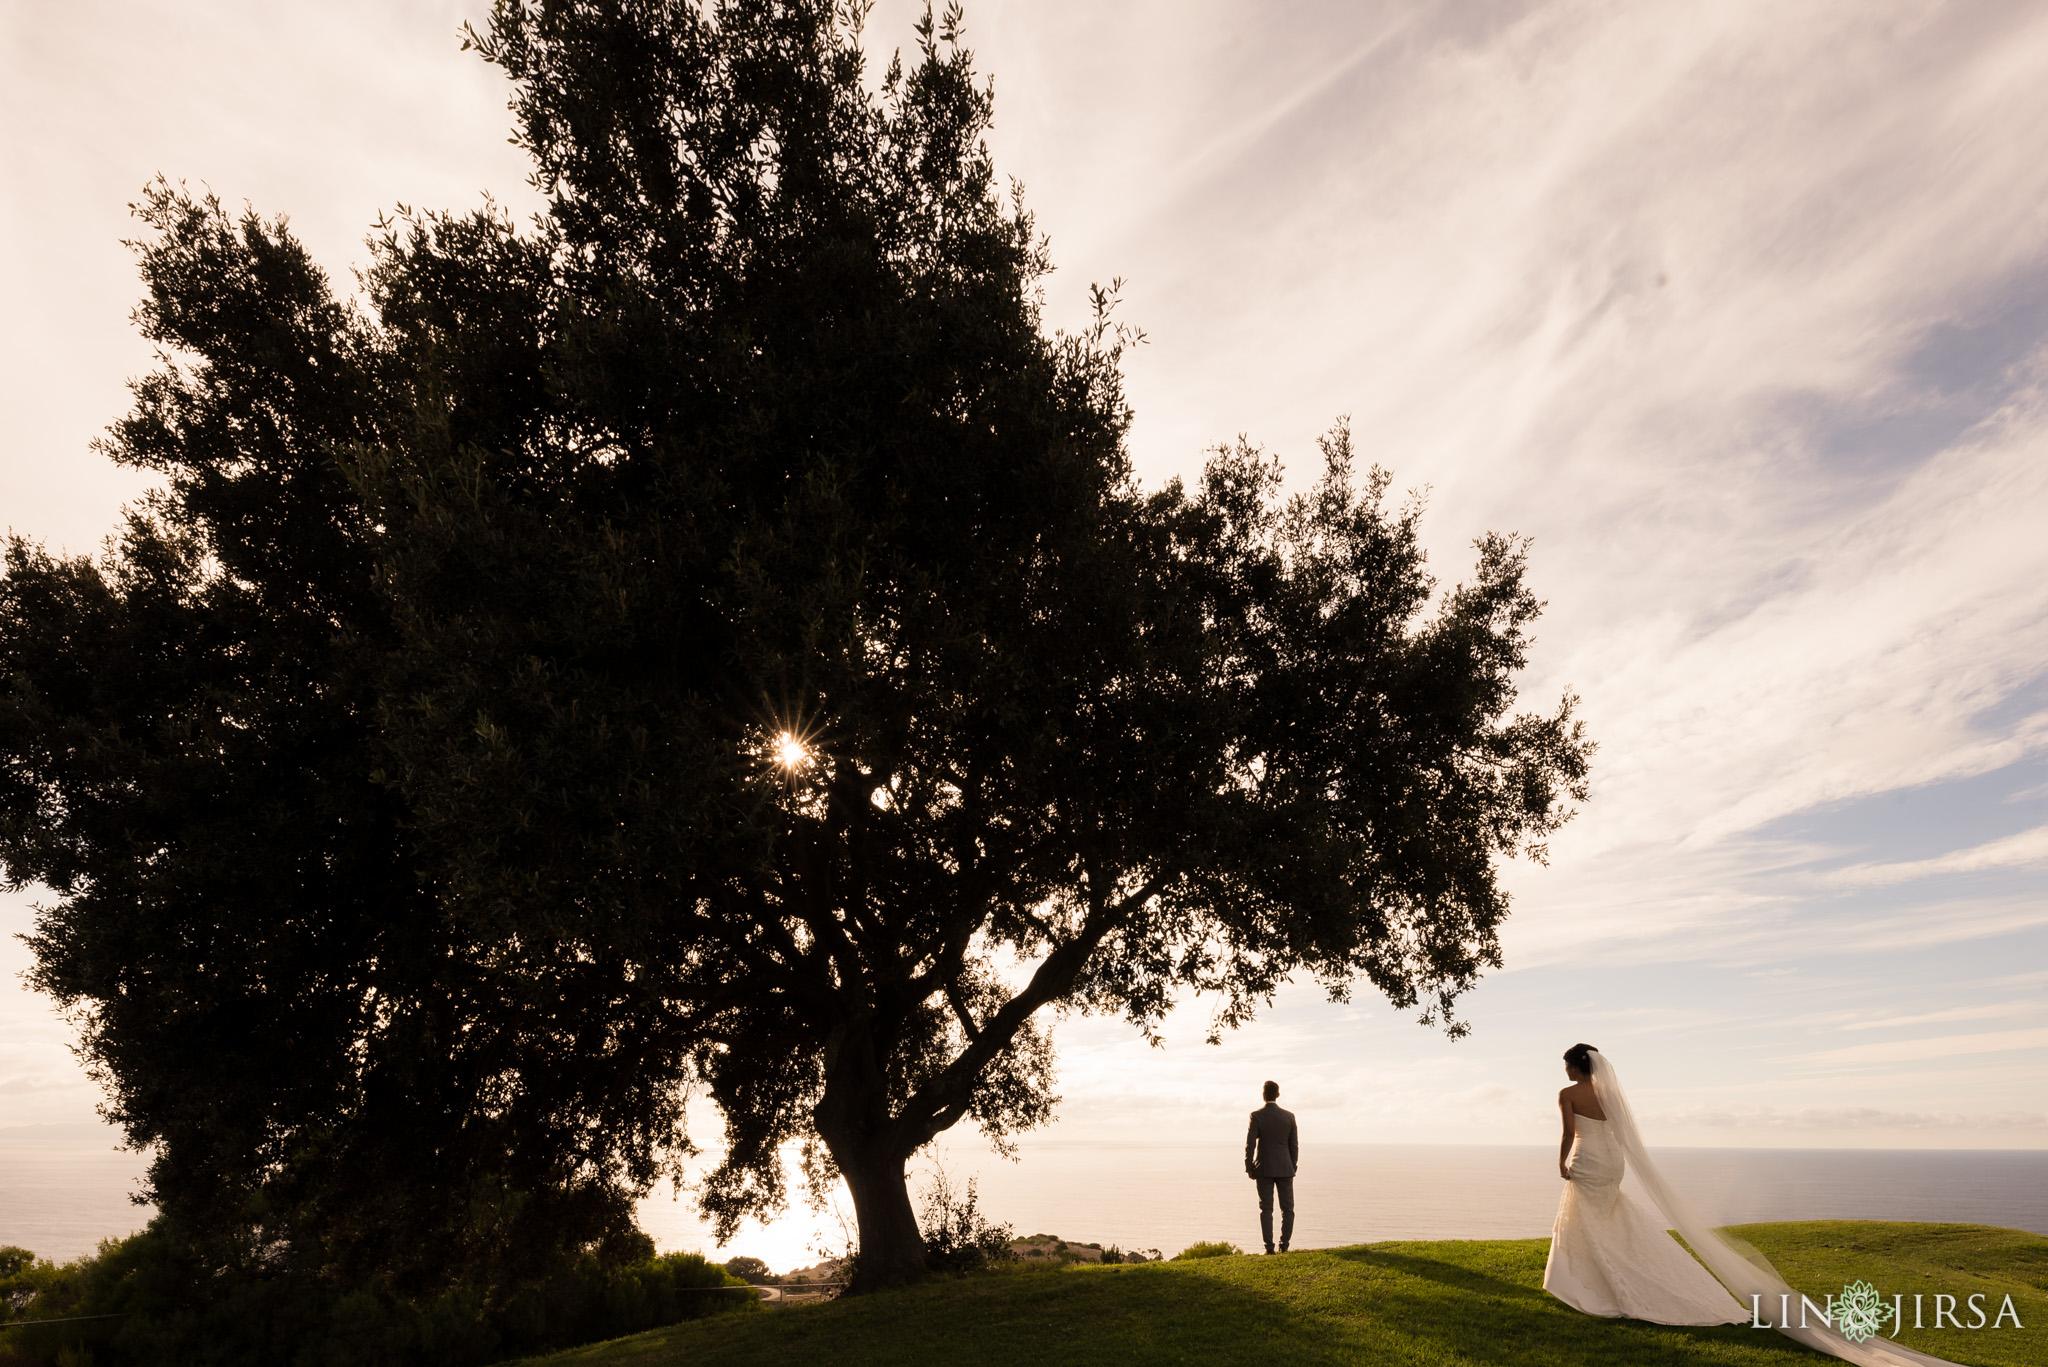 10 los verdes golf course wedding photography